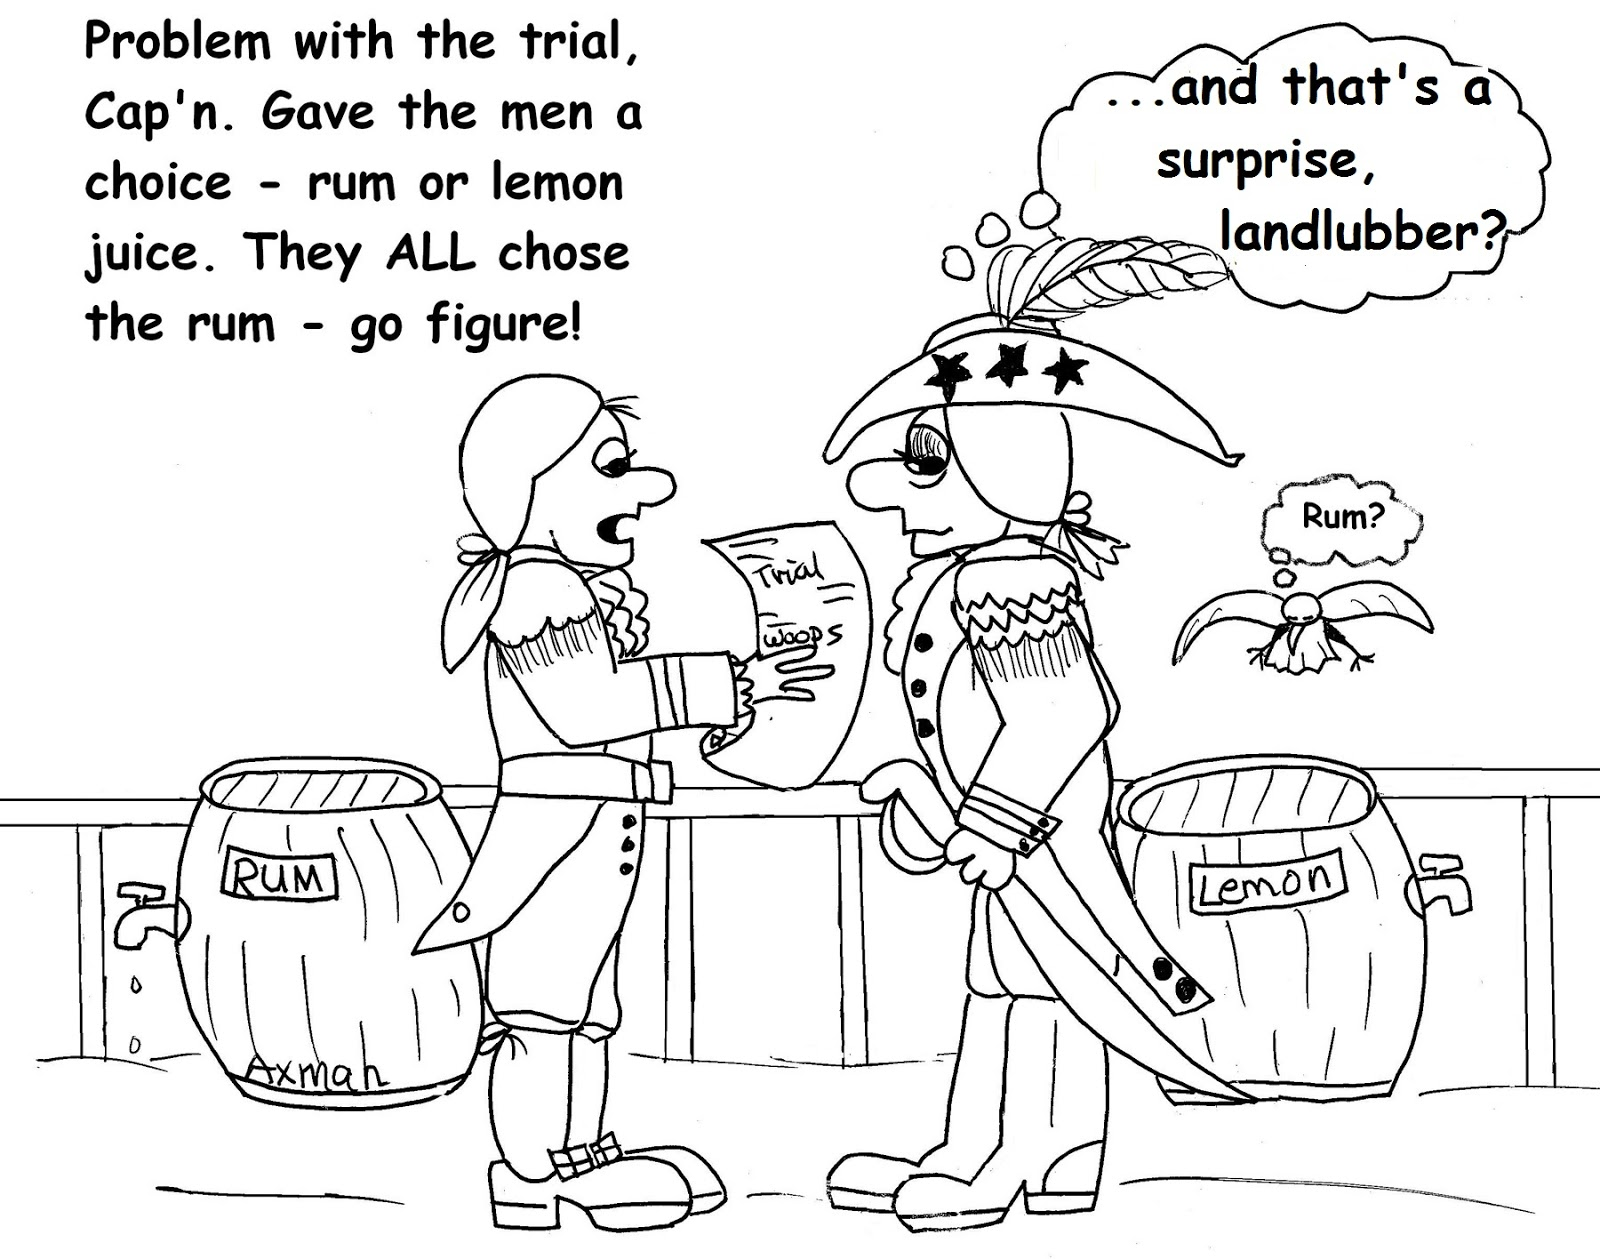 Cancer Clinical Trials Clinical Trials In Cartoons